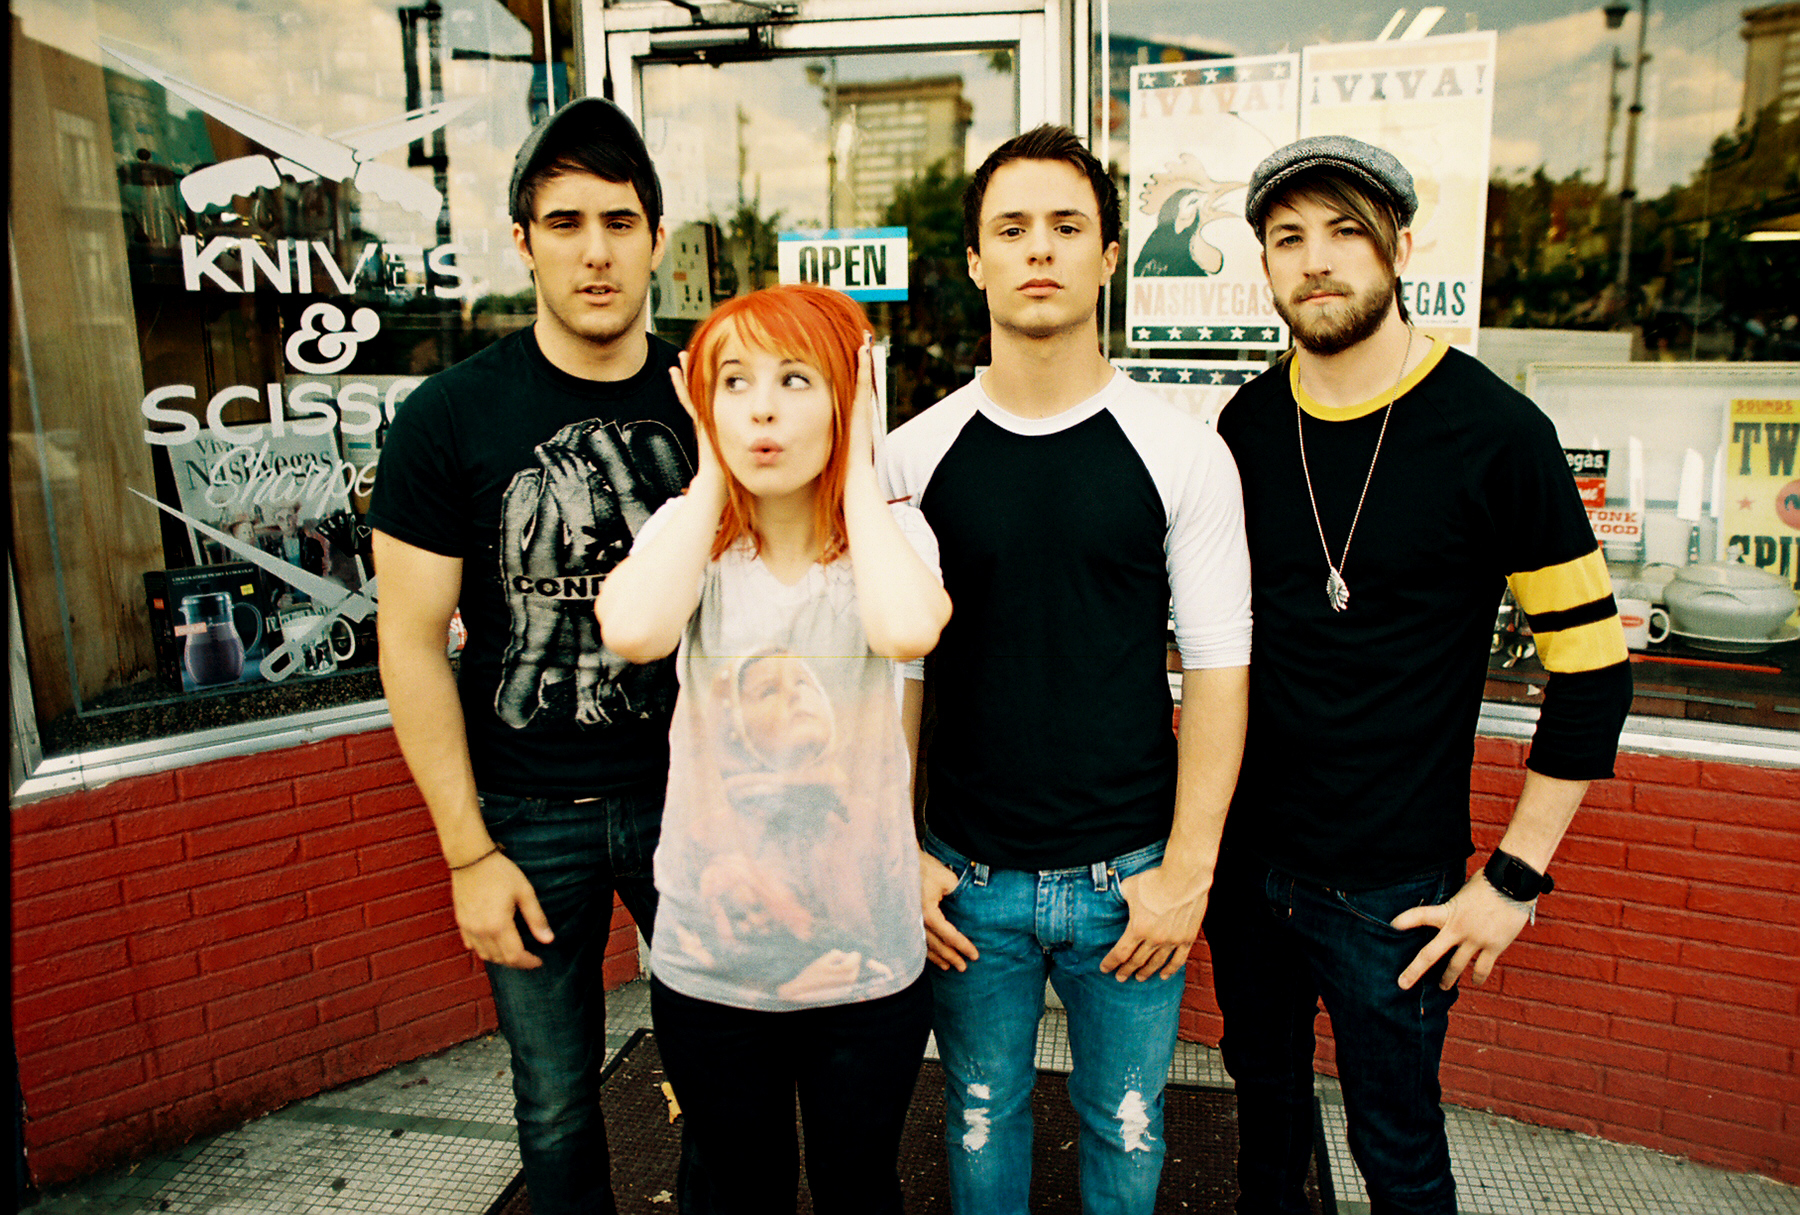 Paramore - Paramore Photo (3107398) - Fanpop Paramore